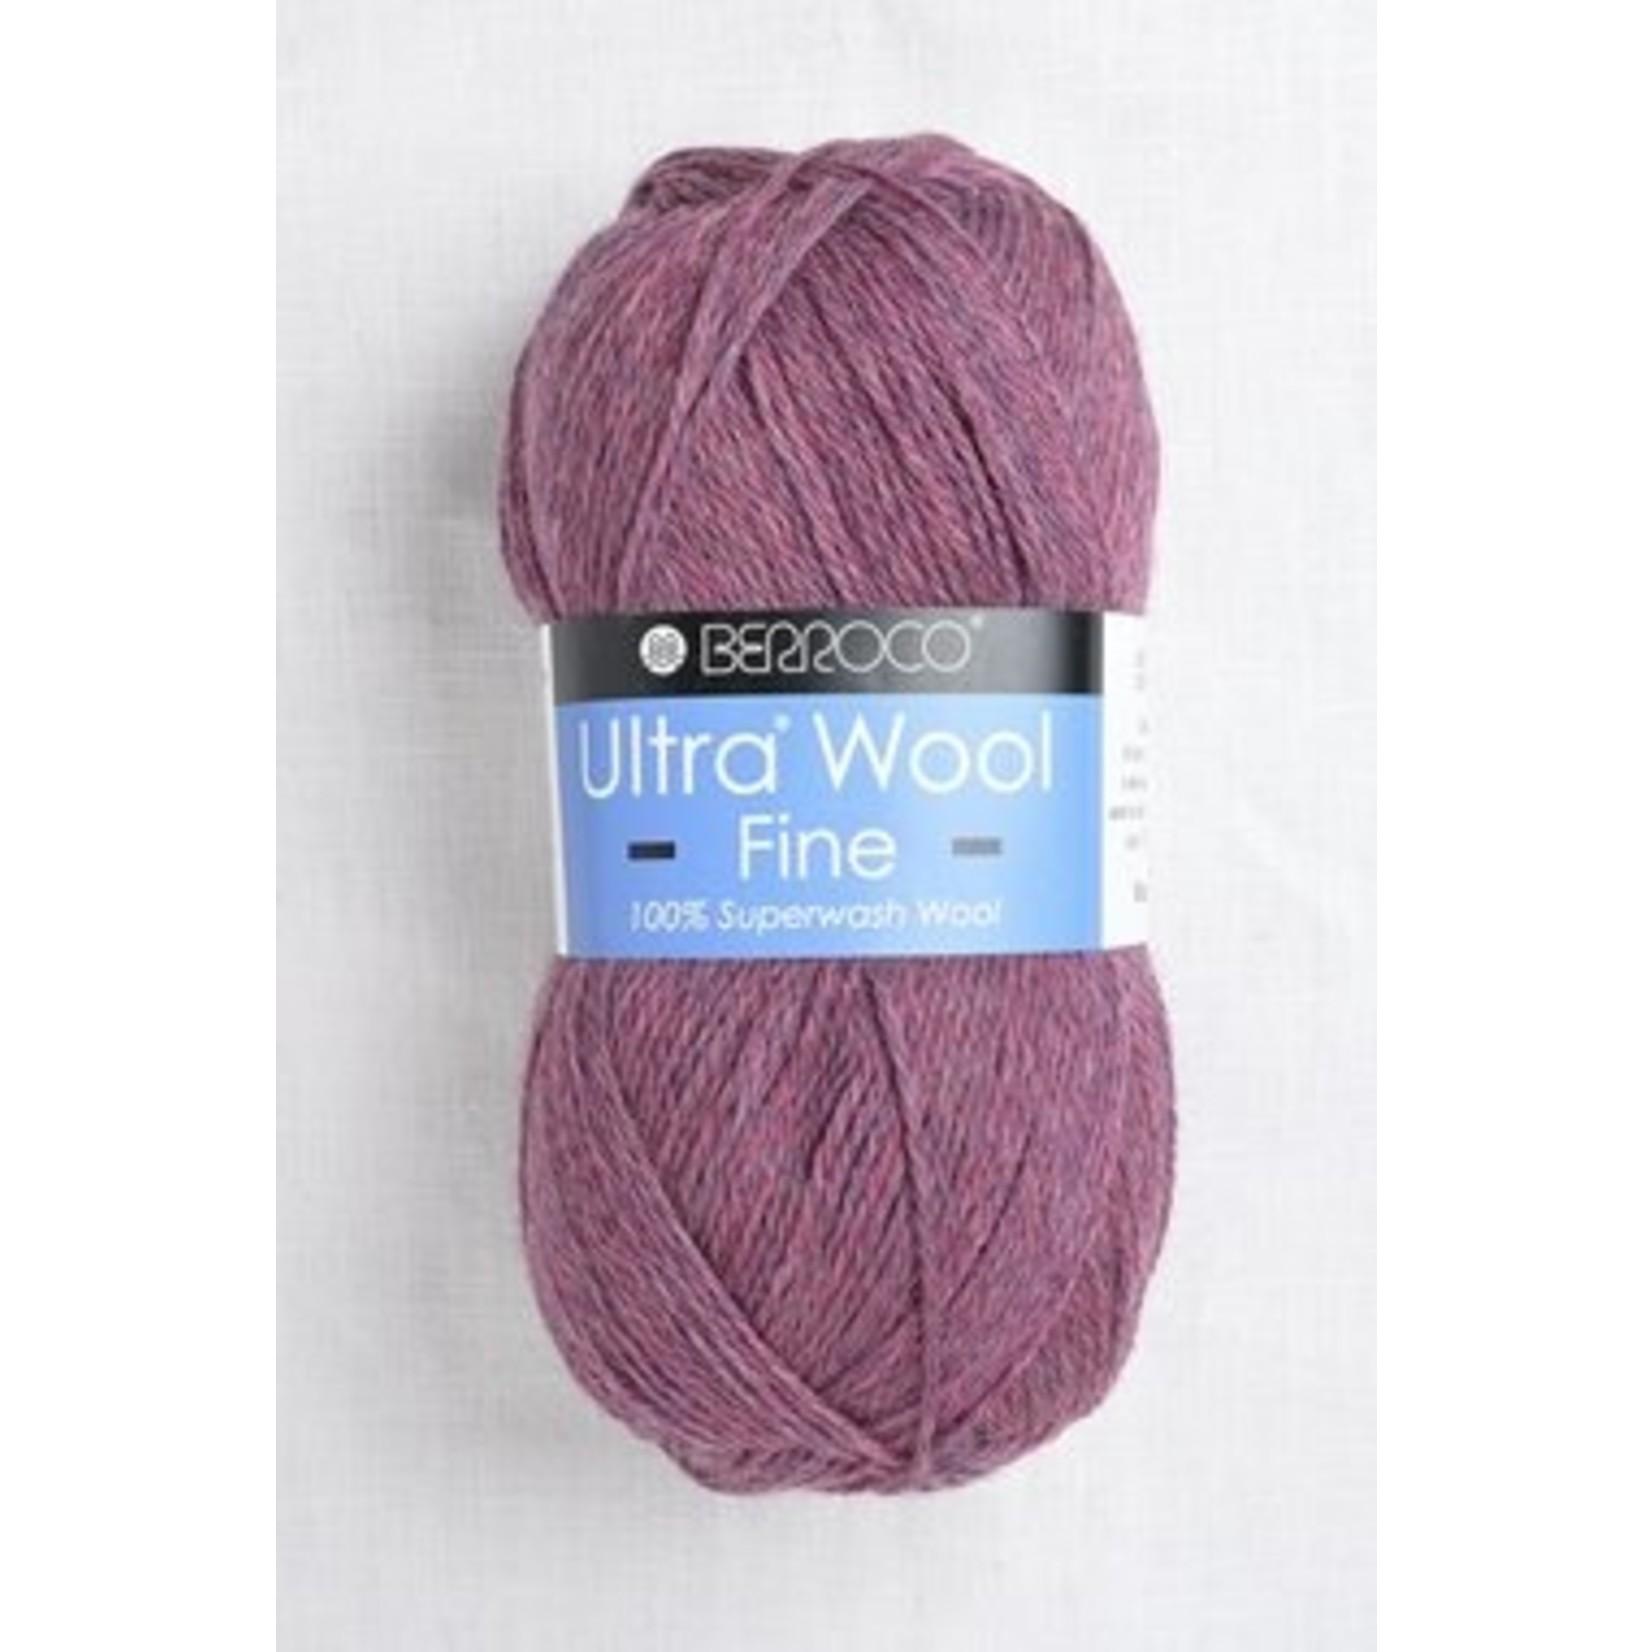 Berroco Berroco Ultra Wool Fine, 53153, Heather